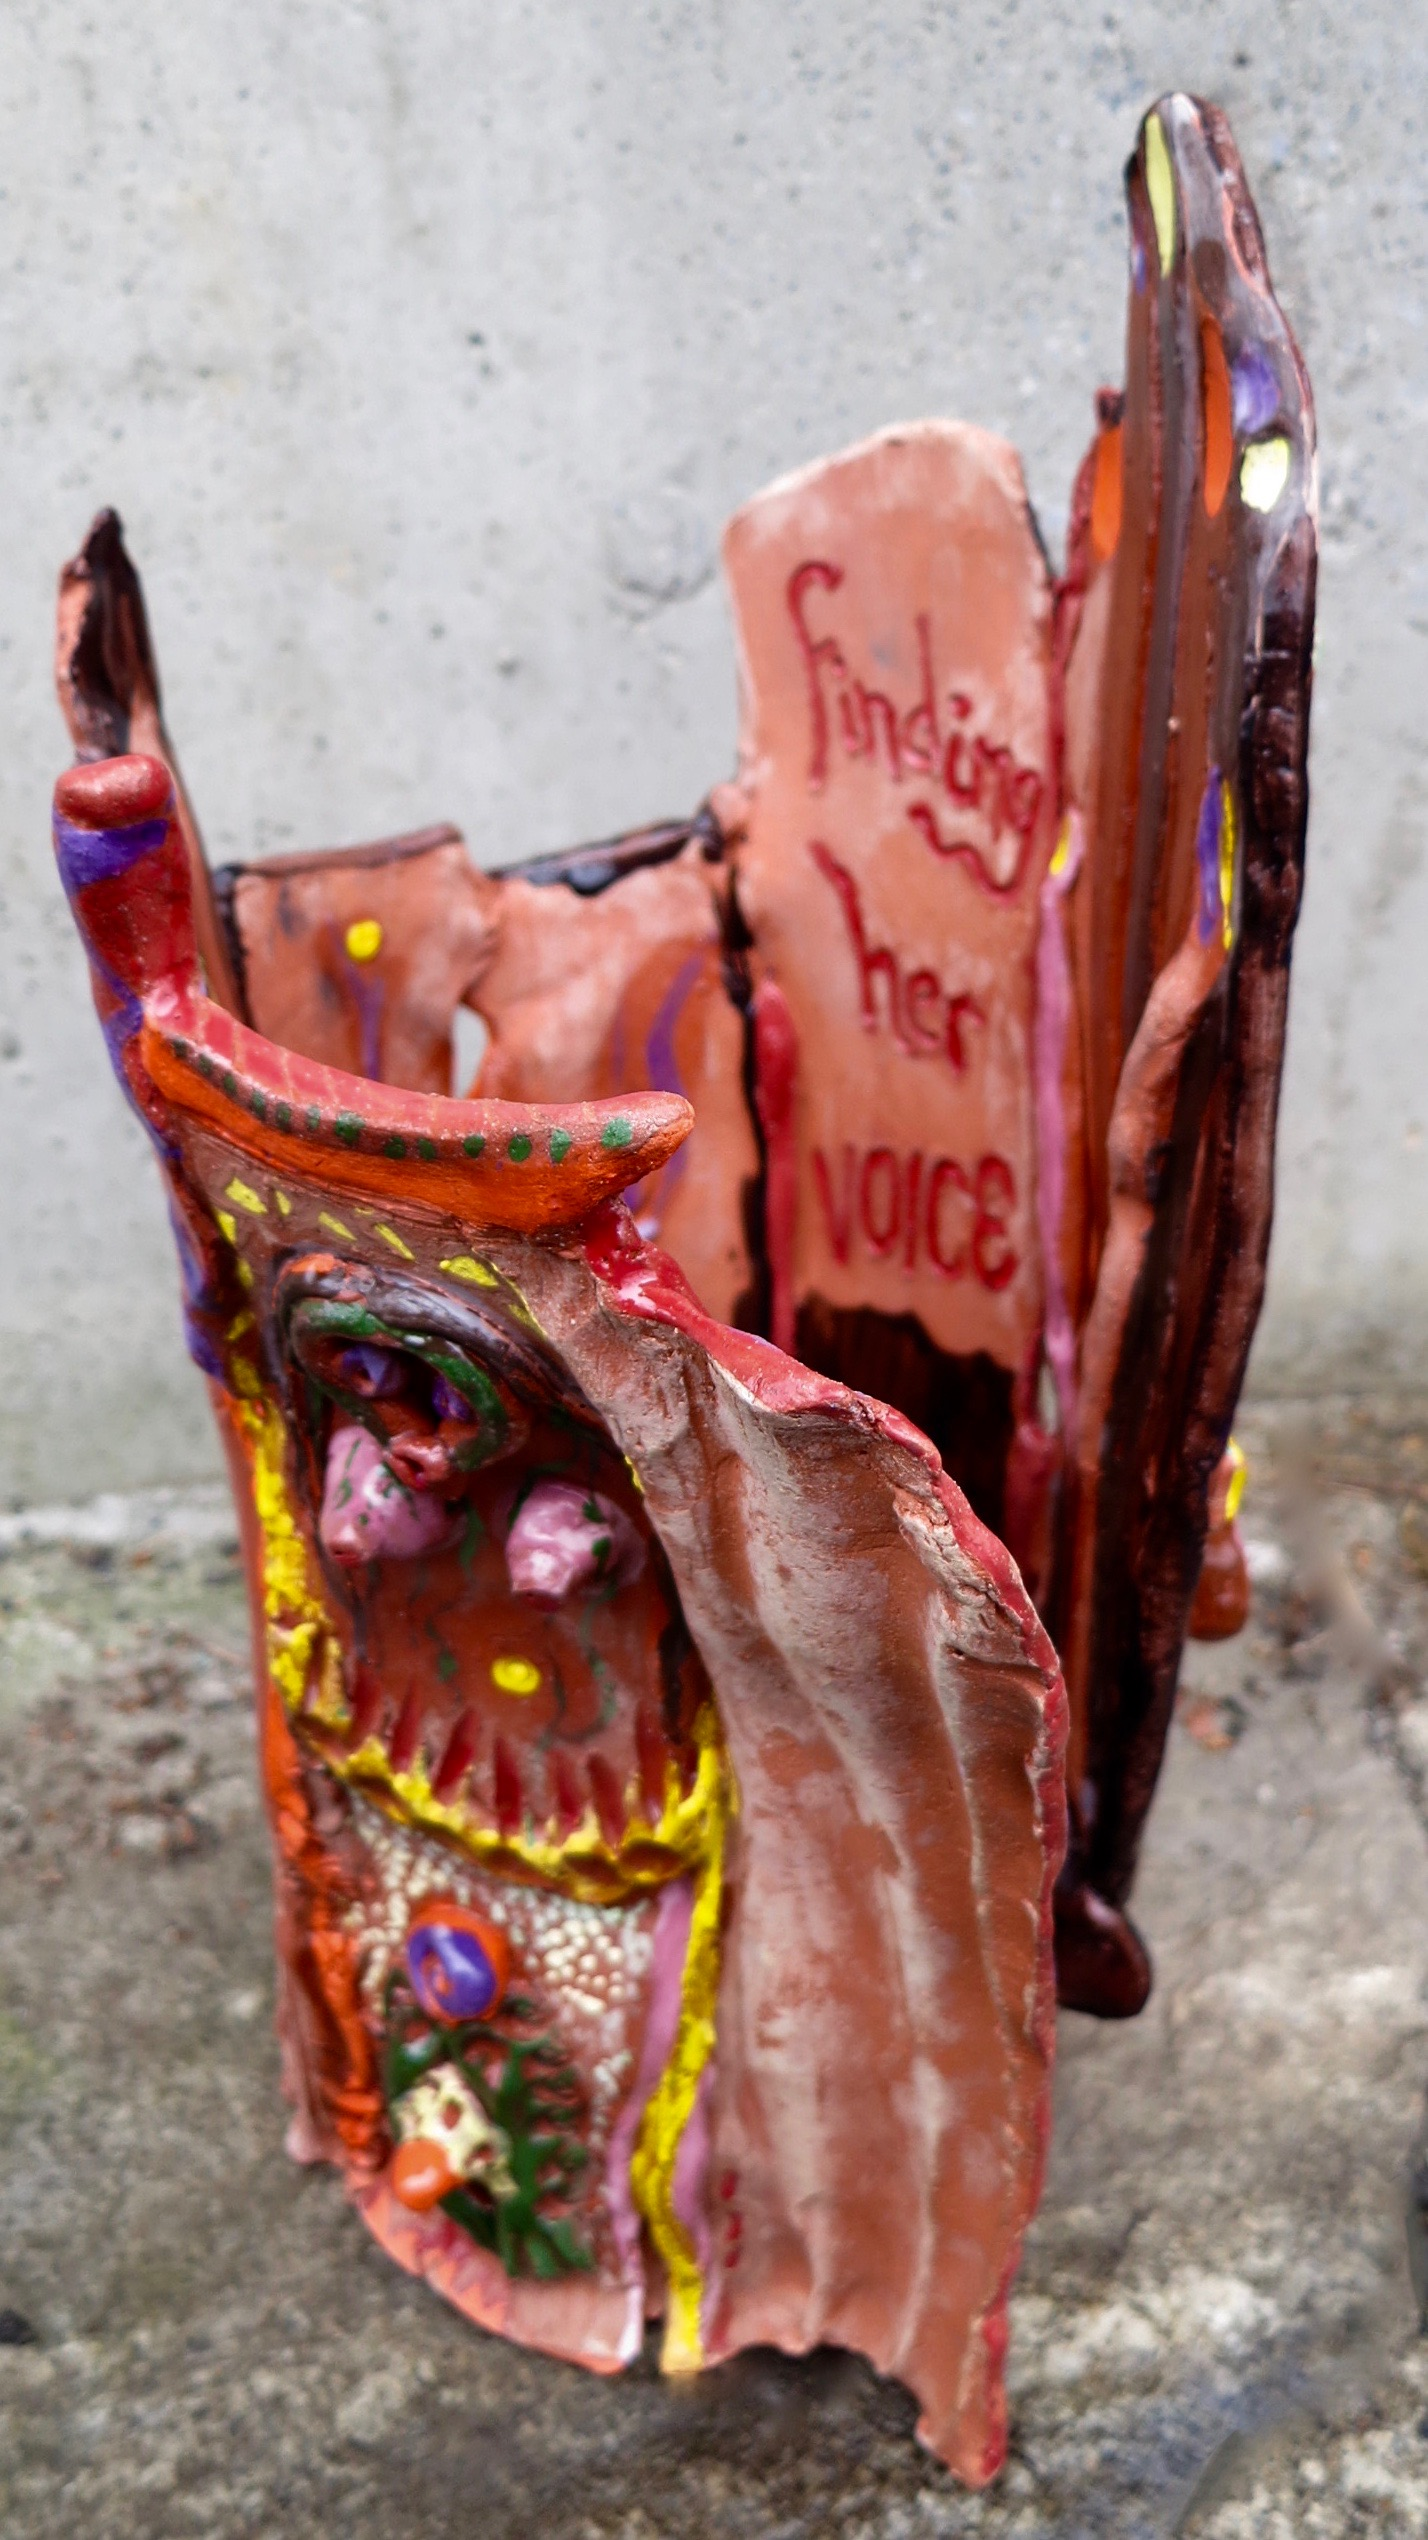 Finding Her Voice, open form ceramic sculpture